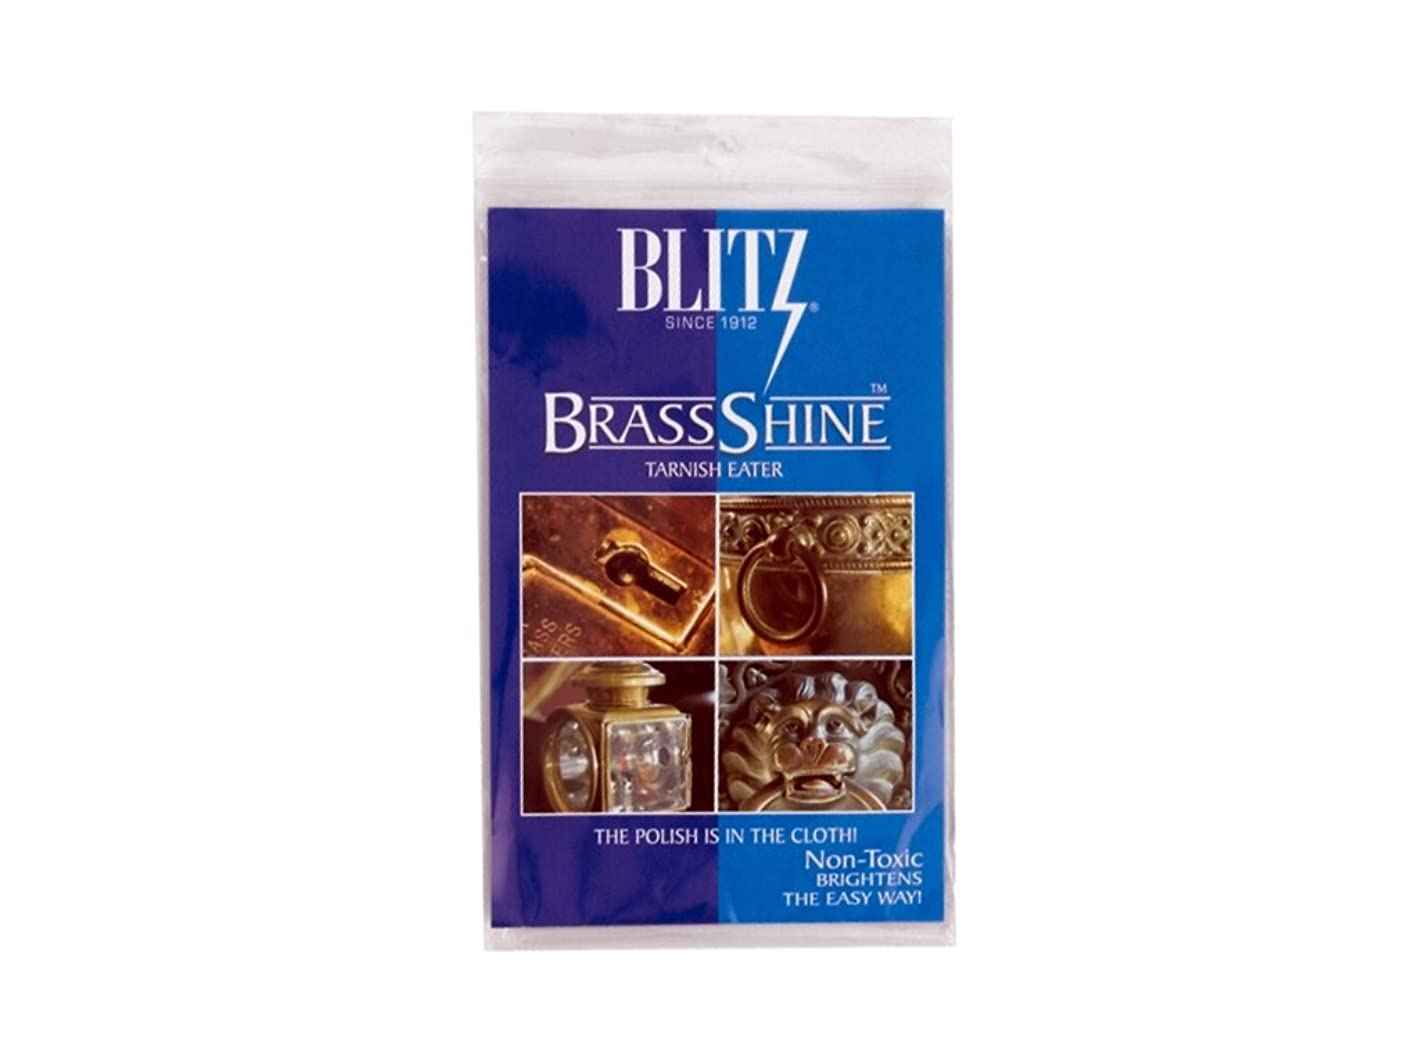 Blitz Brass Tarnish Eater Cloth-Single Ply, Treated, 2 Pack a37622344144233